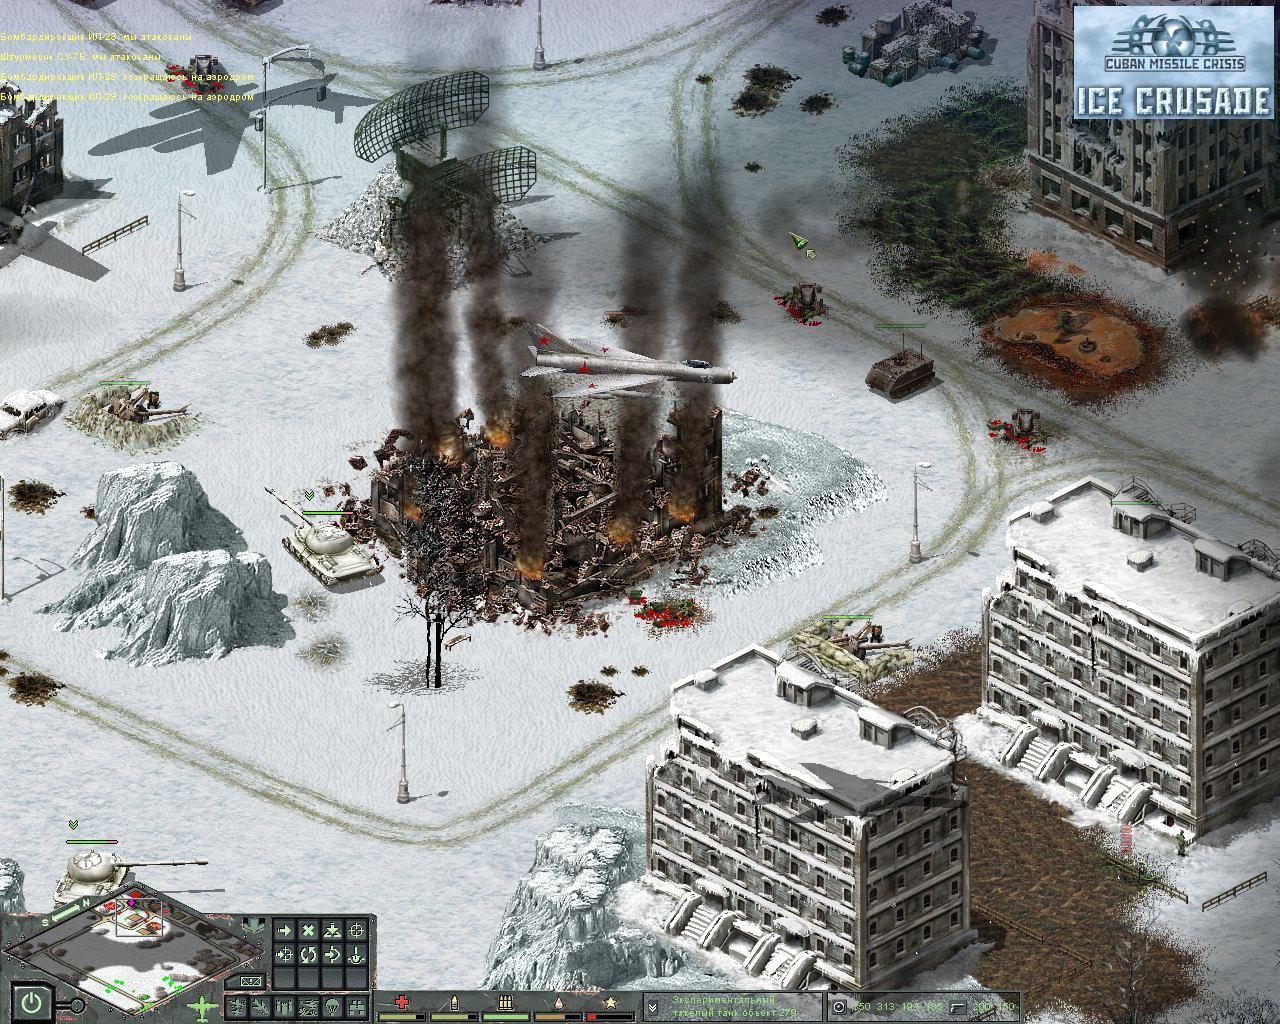 Cuban Missile Crisis: Ice Crusade screenshot